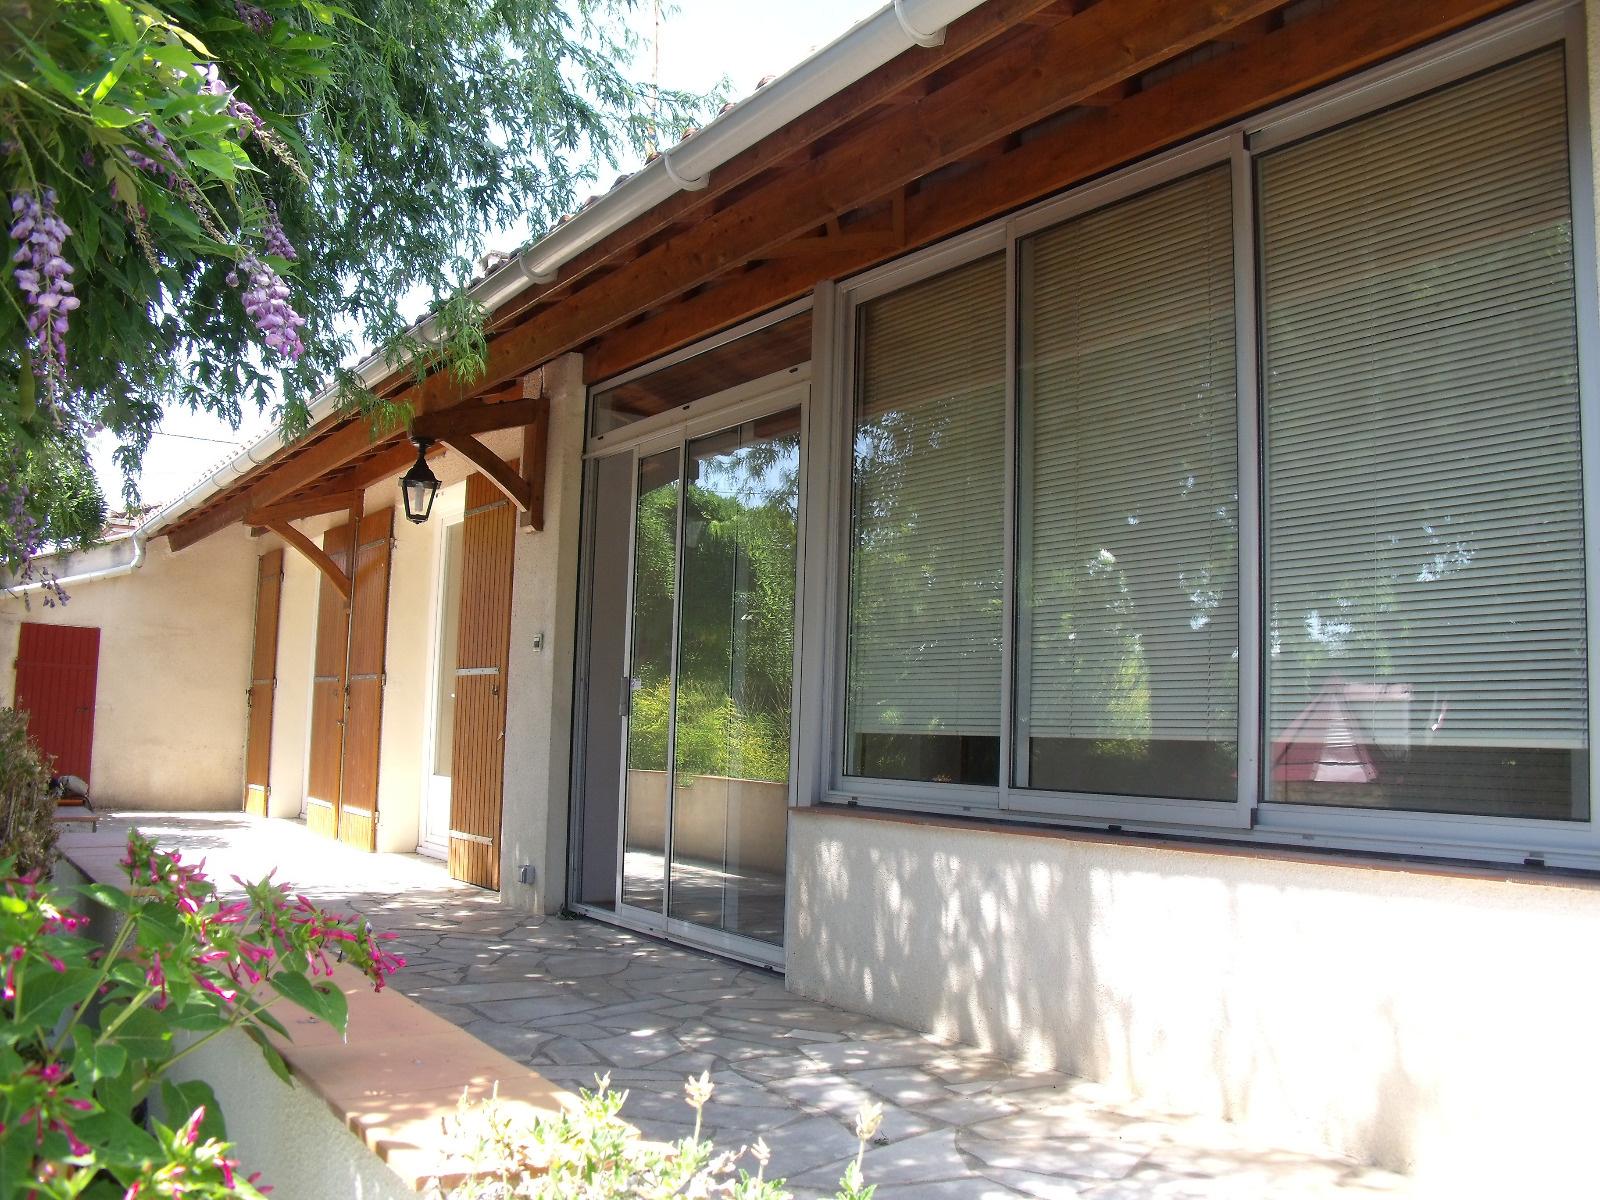 Vente maison semi enterree avec jardin clos for Jardin clos